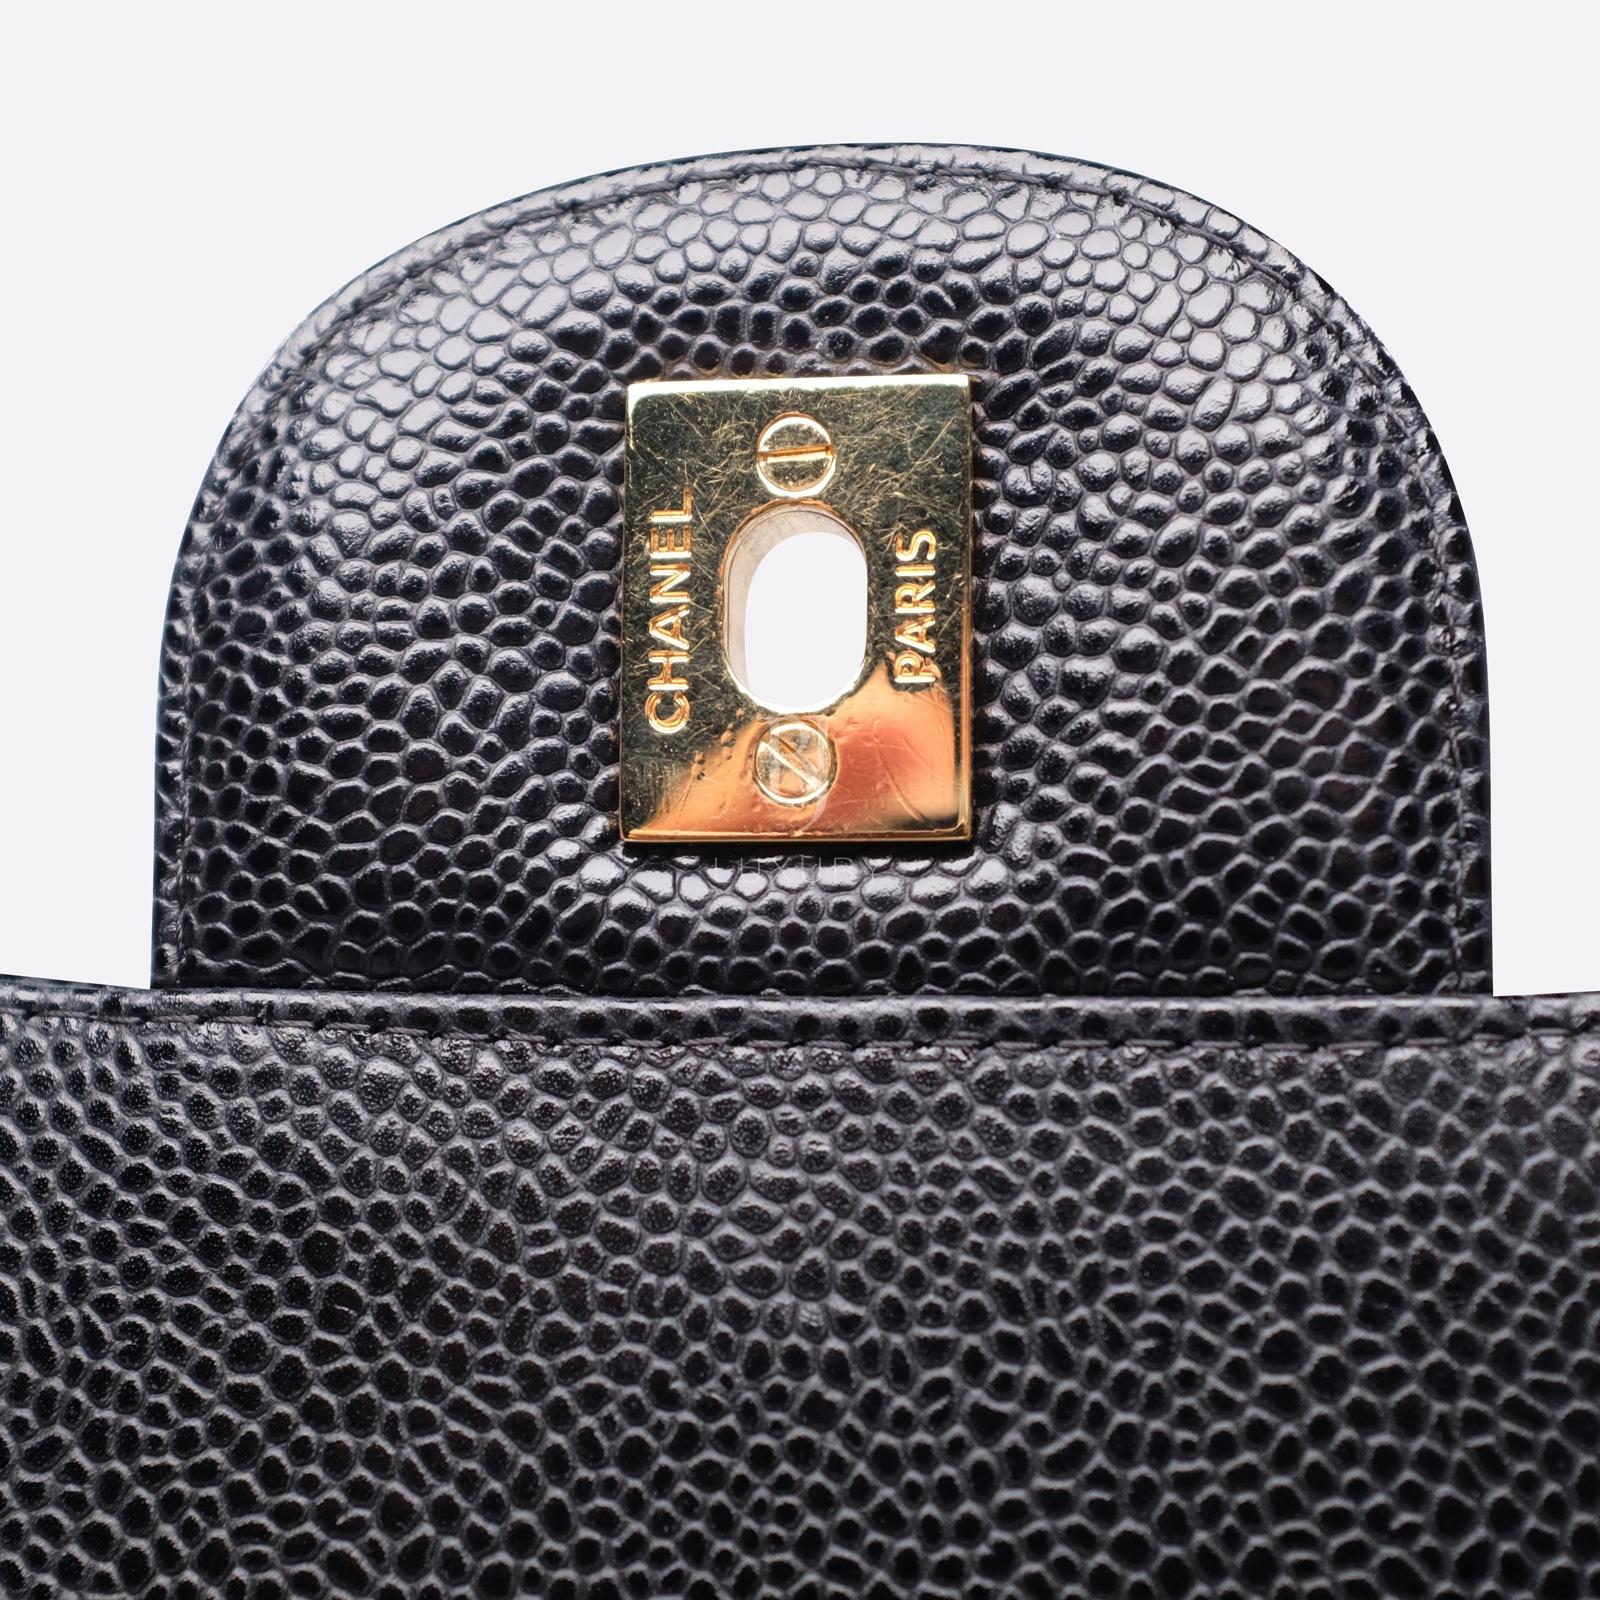 Chanel Classic Handbag Caviar Maxi Black BJ Luxury 16.jpg